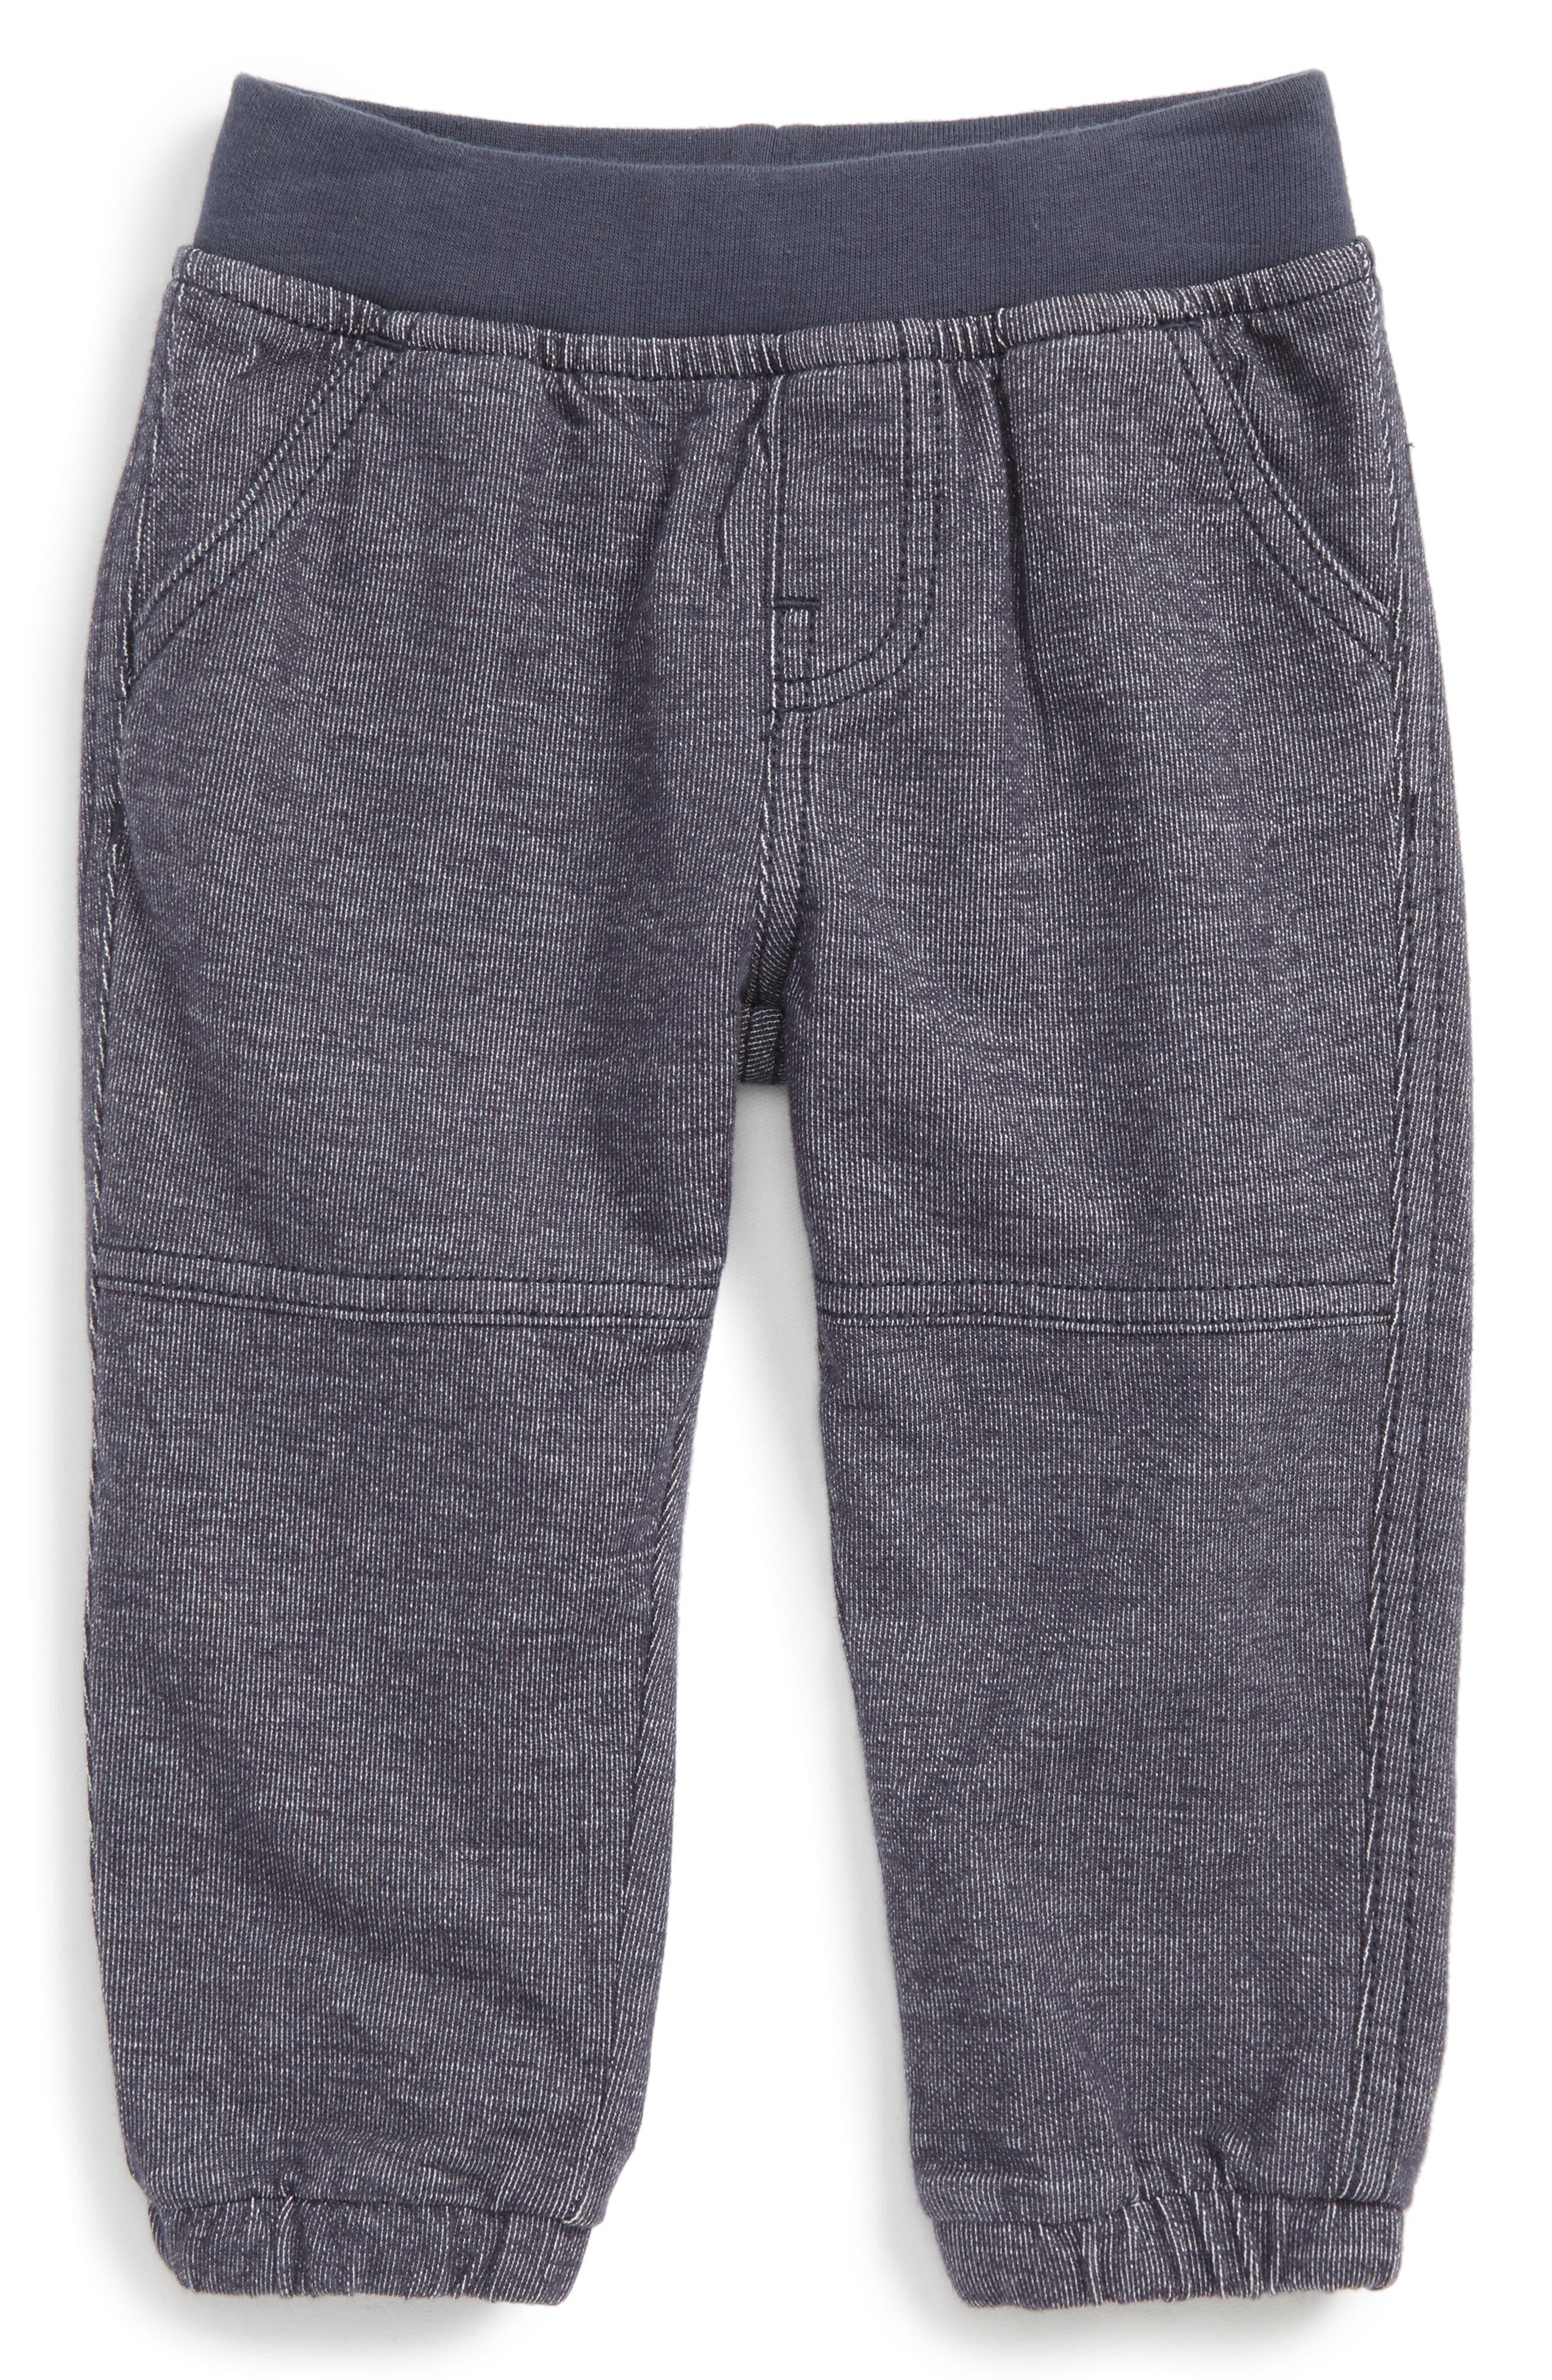 Main Image - Tea Collection Denim Look Pants (Baby Boys)